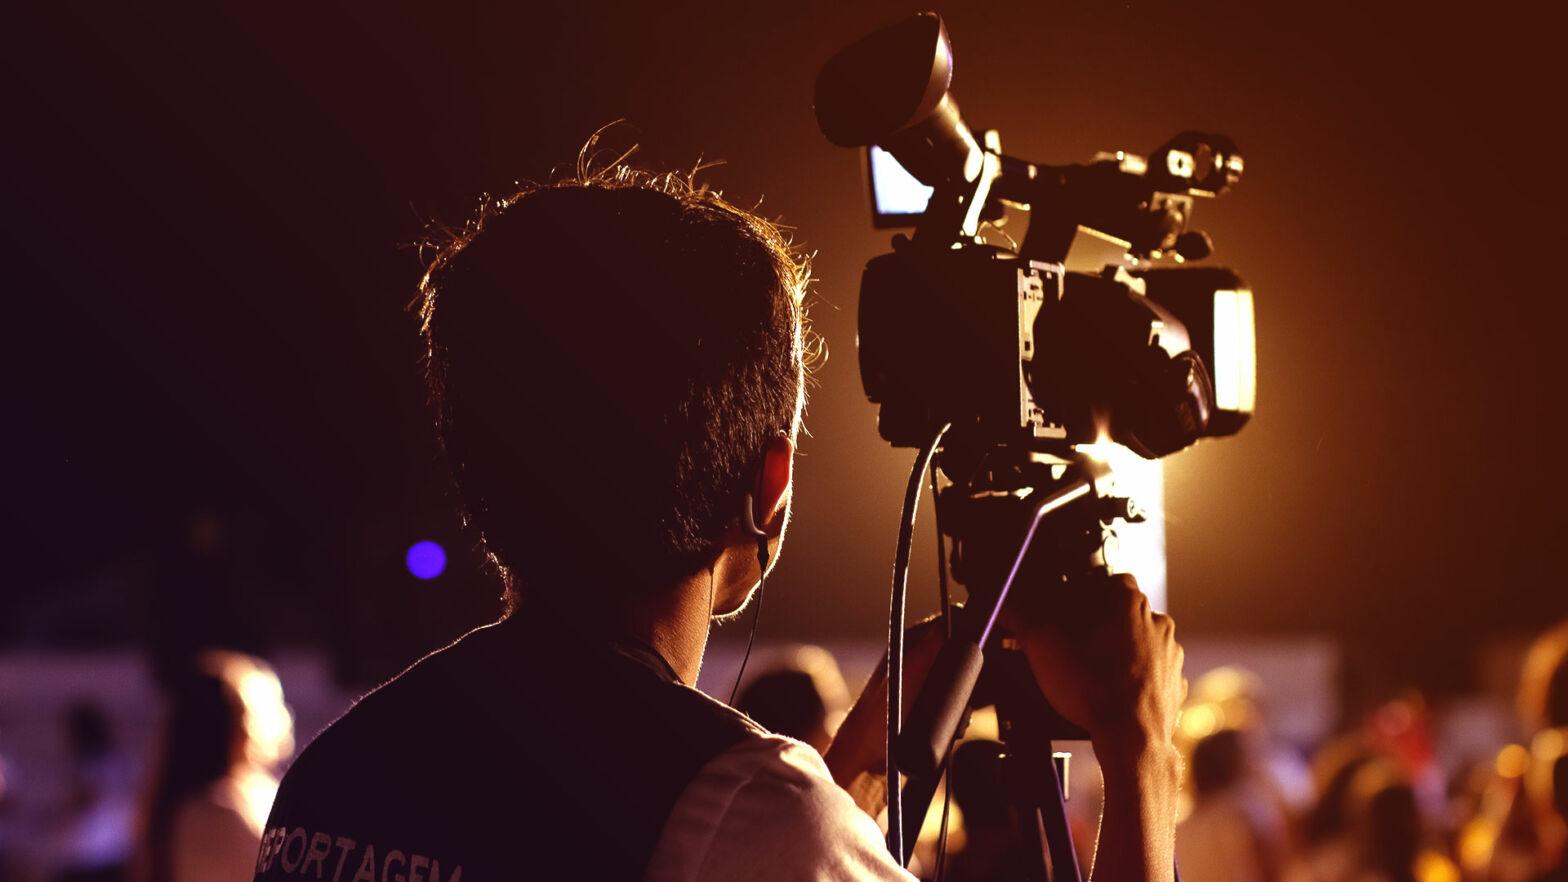 Guerilla Filmmaking - Featured Image